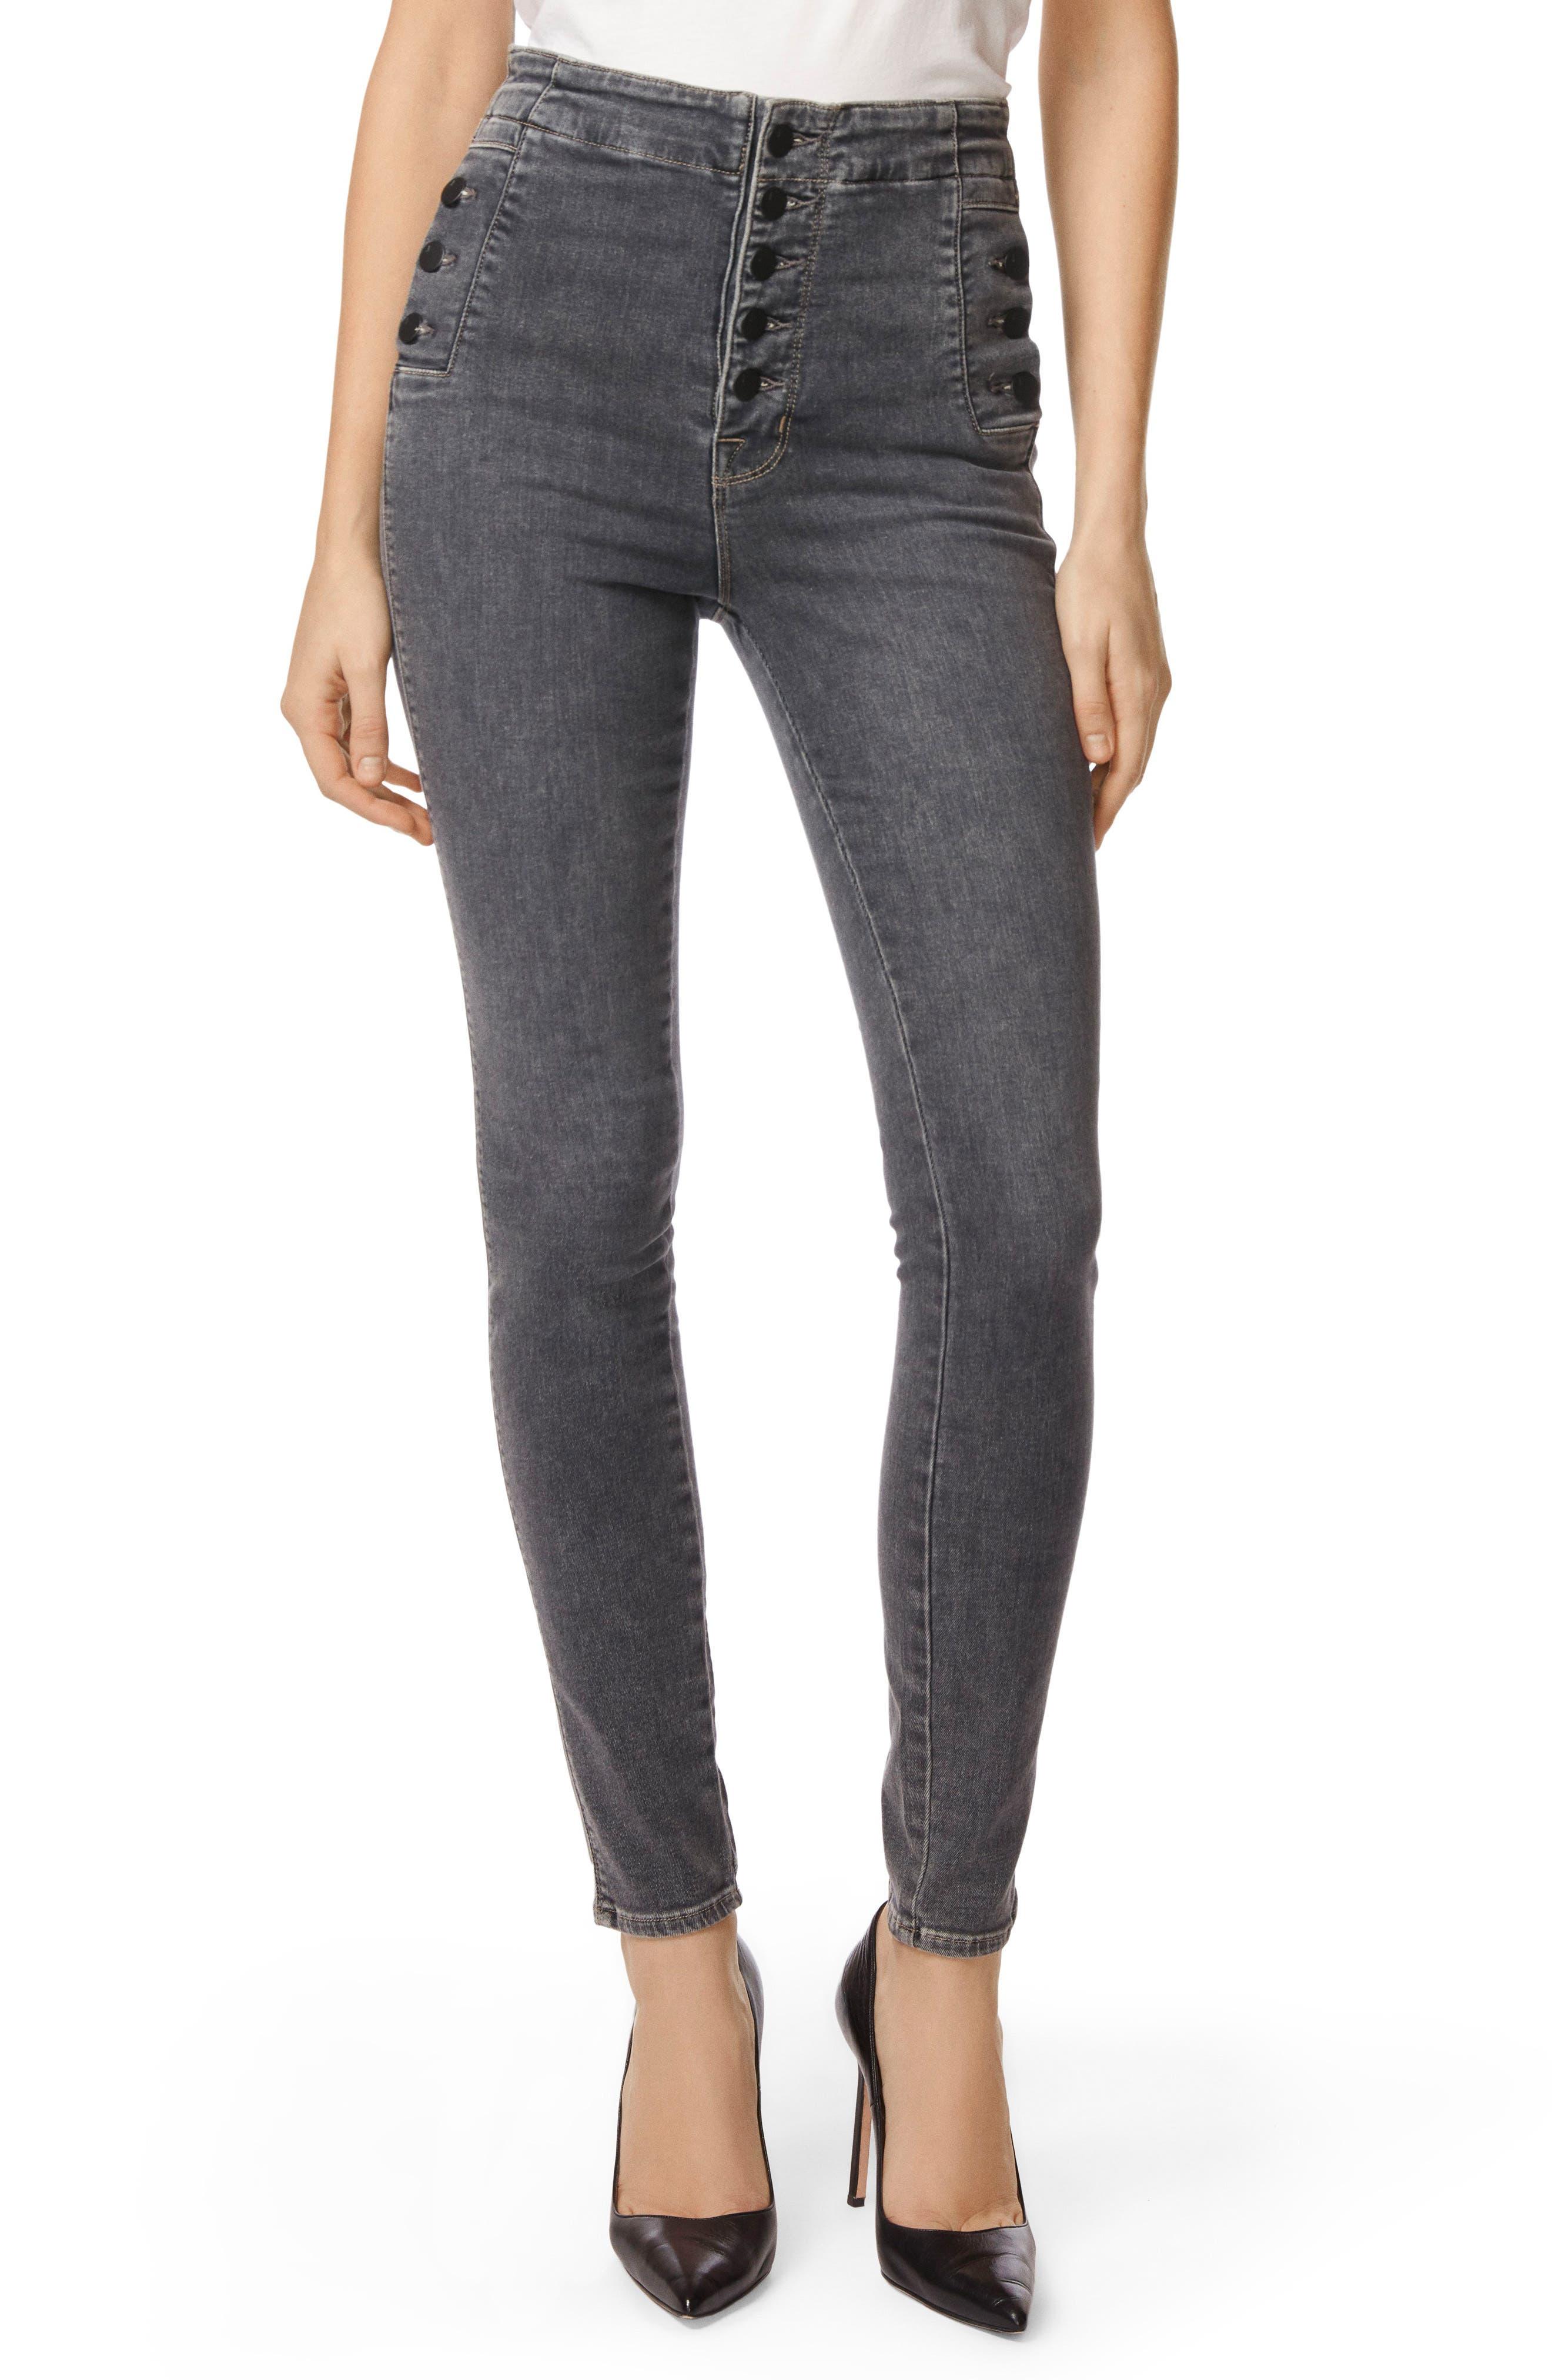 Natasha Sky High High Waist Super Skinny Jeans,                         Main,                         color, Obscura